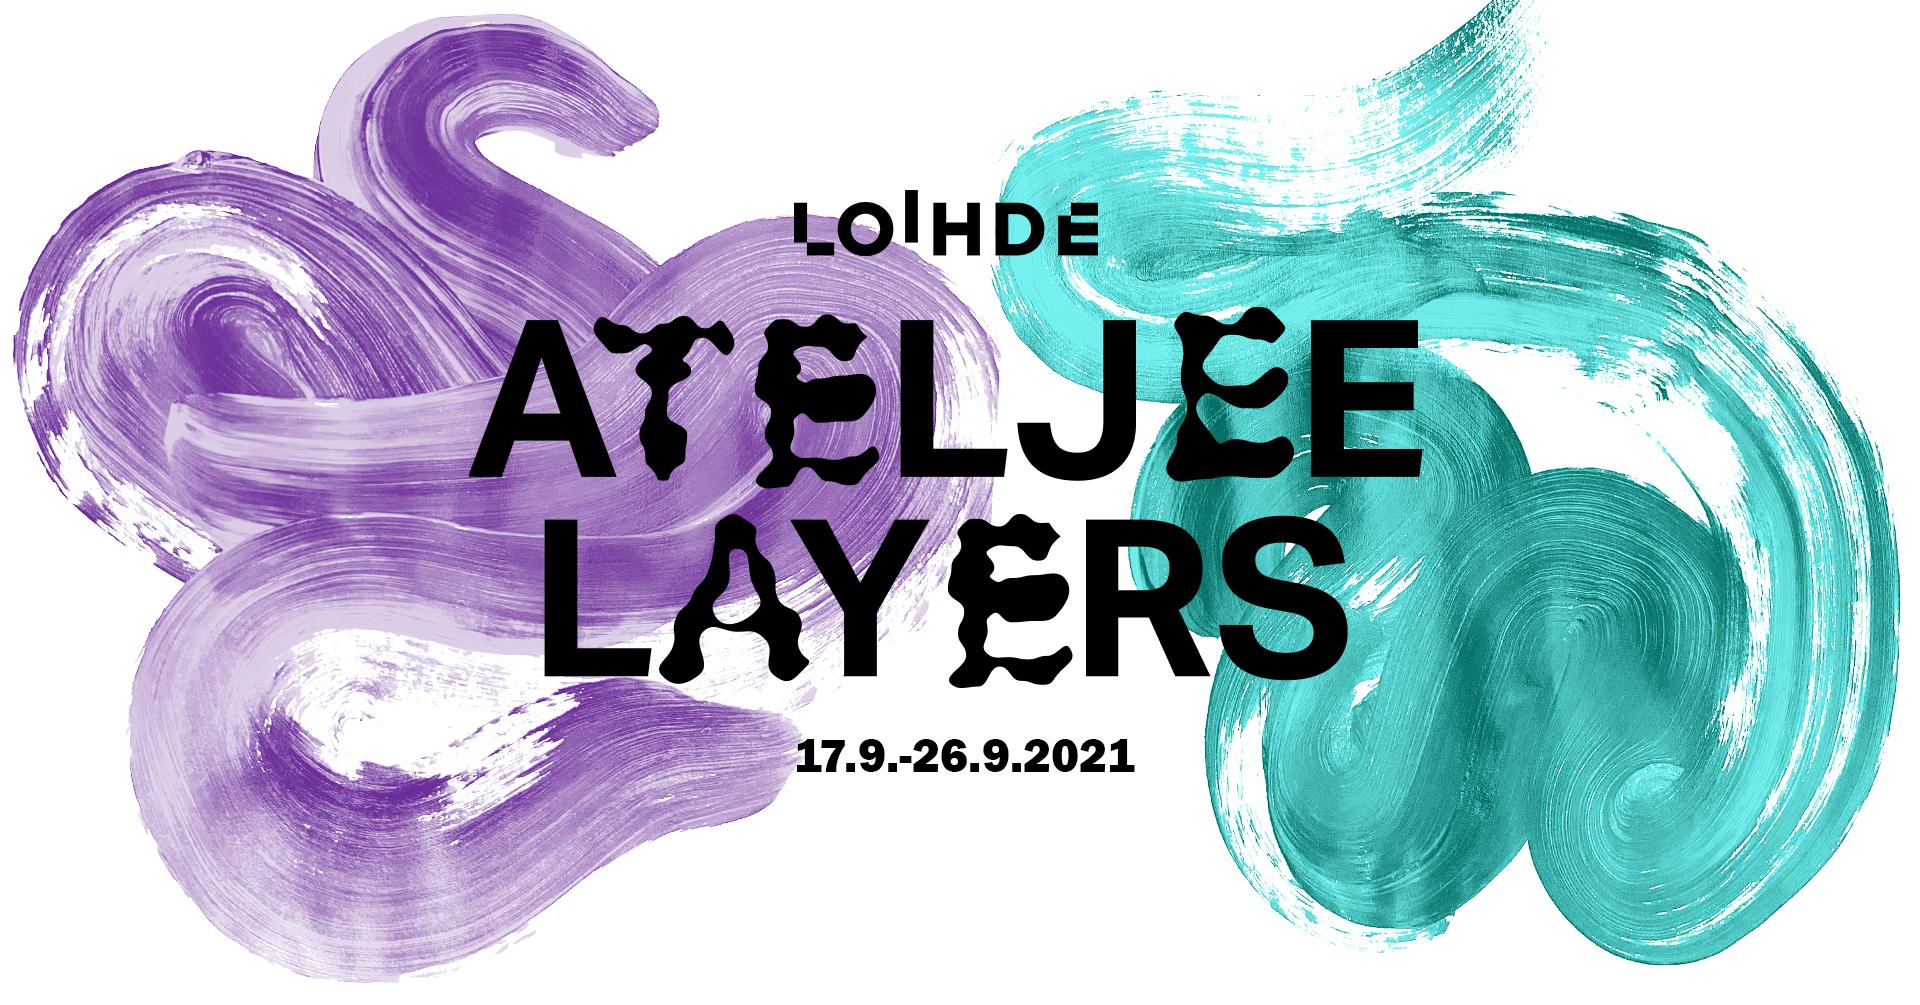 Loihde Ateljee, Layers, 17.-26.9.2021